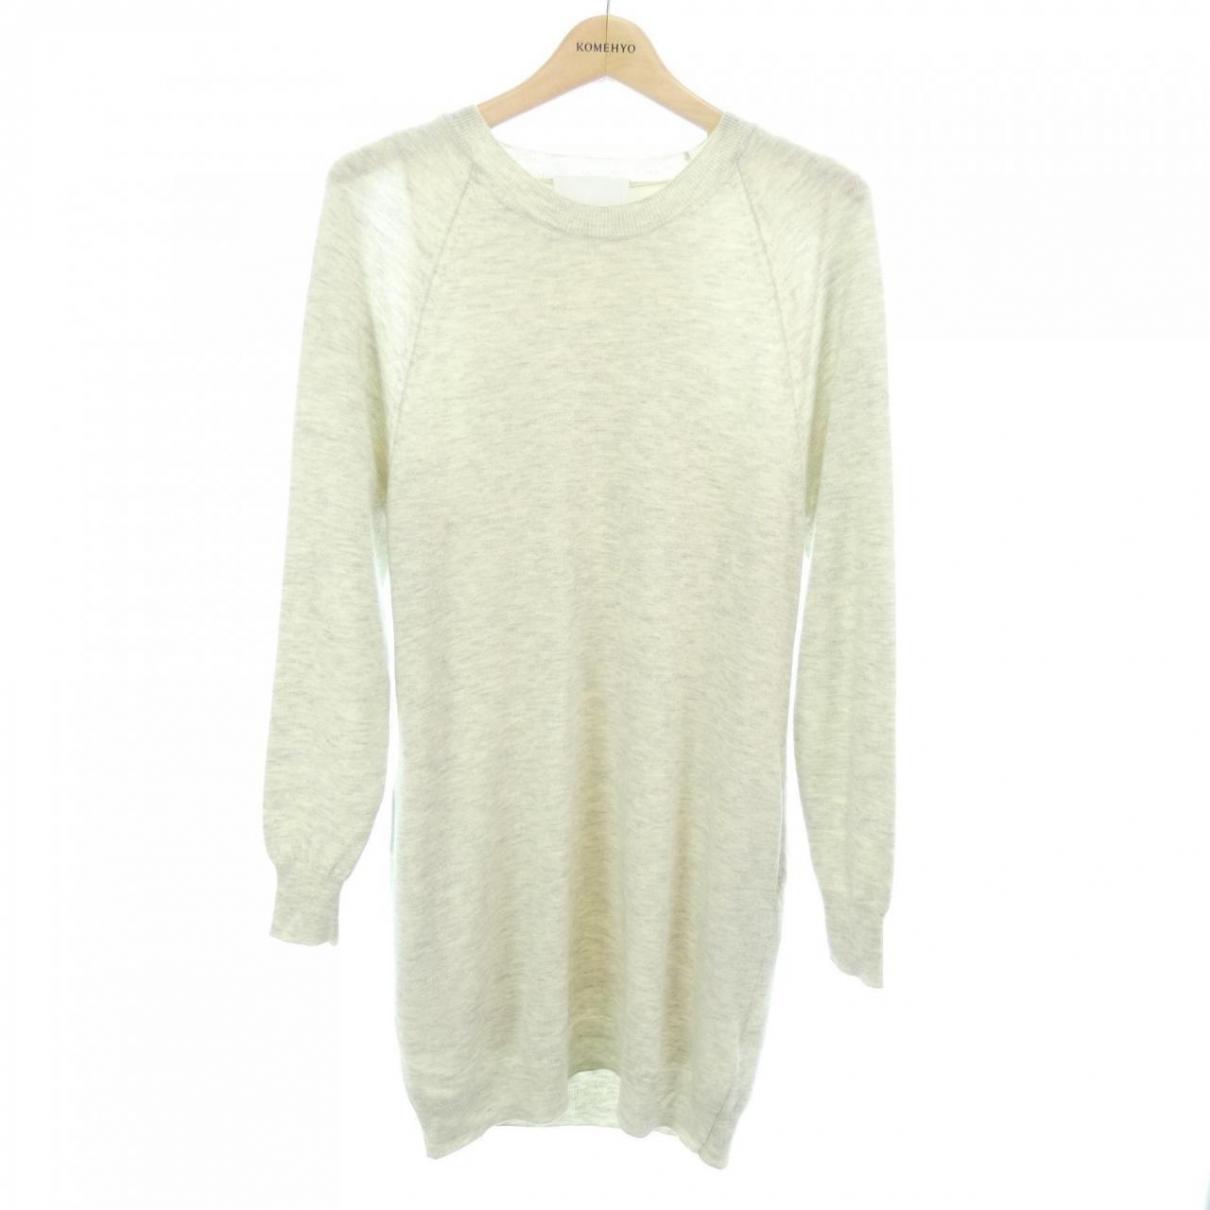 3.1 Phillip Lim \N Pullover in  Ecru Wolle